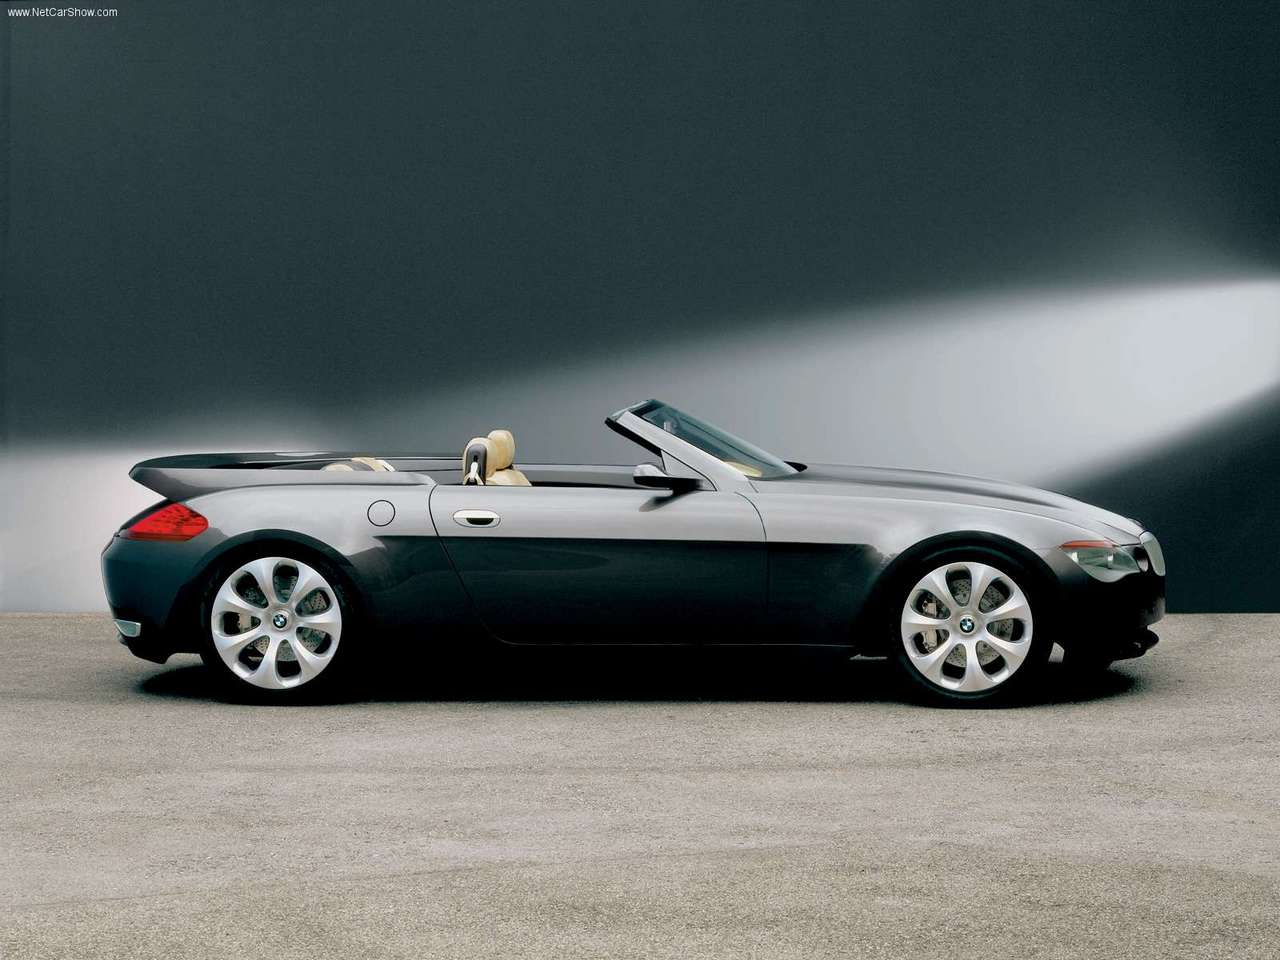 BMW - Auto twenty-first century: 2000 BMW Z9 Convertible Concept